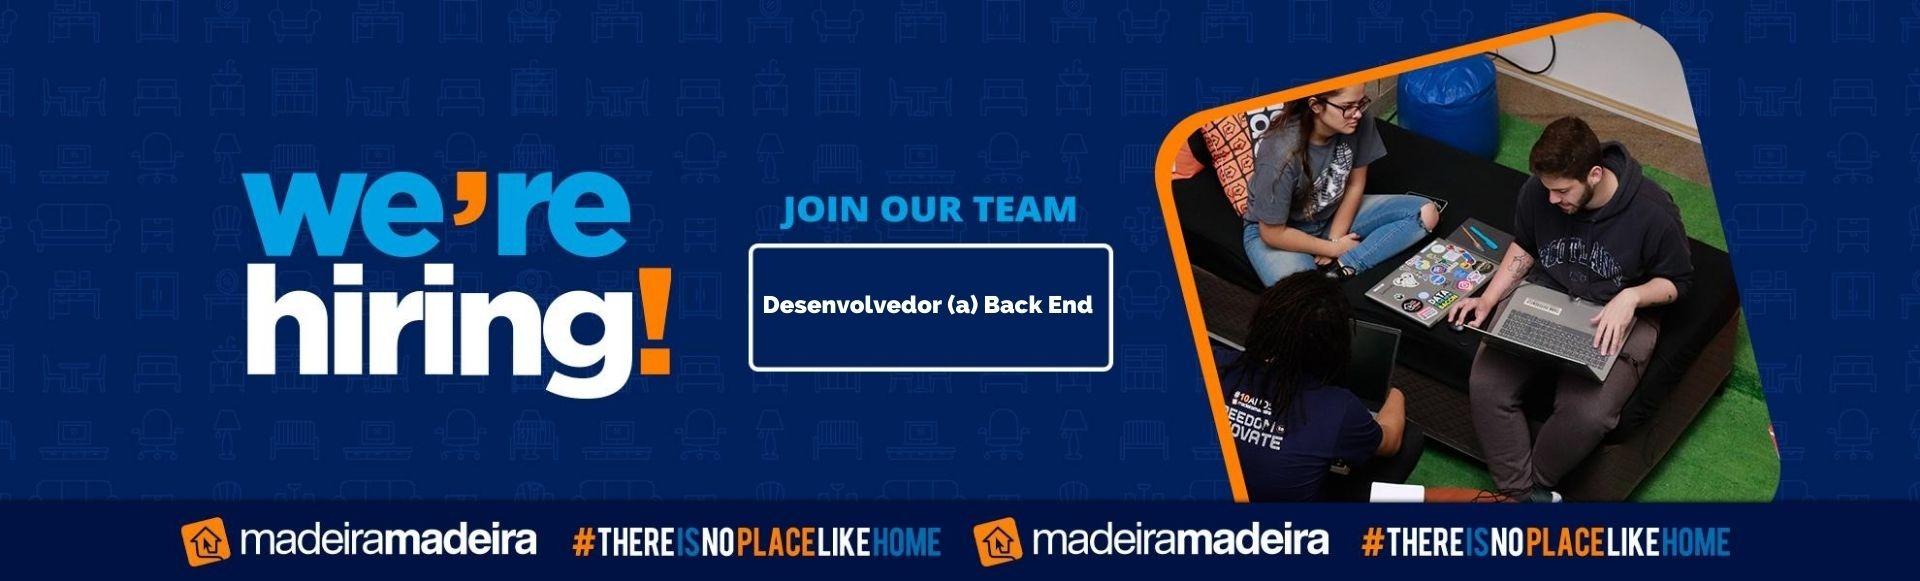 Desenvolvedor (a) Back End